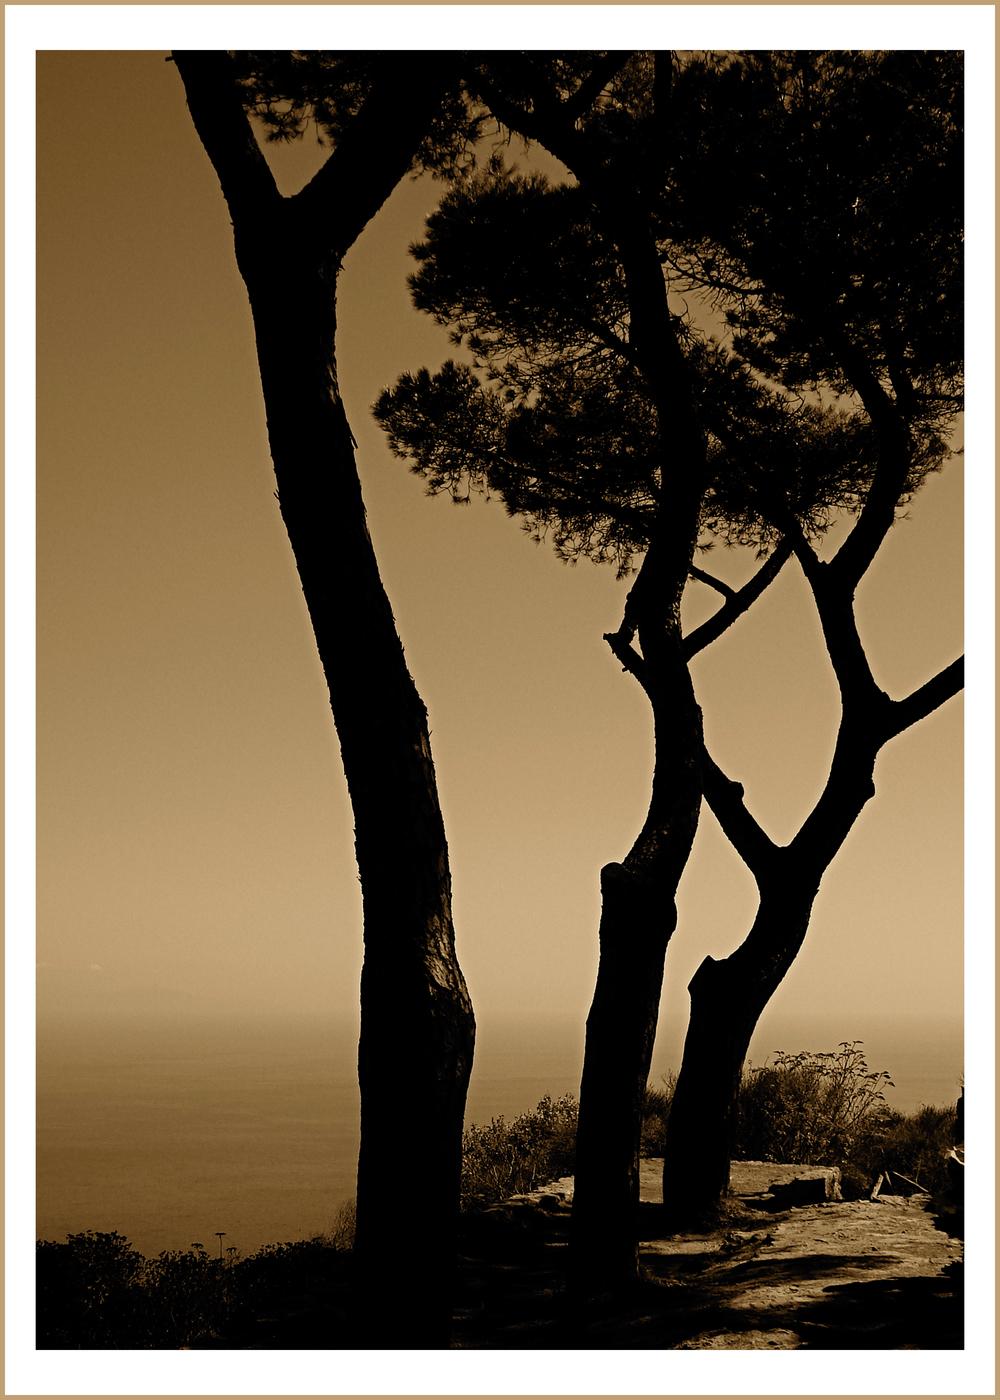 3-TreesAnaCapri.jpg